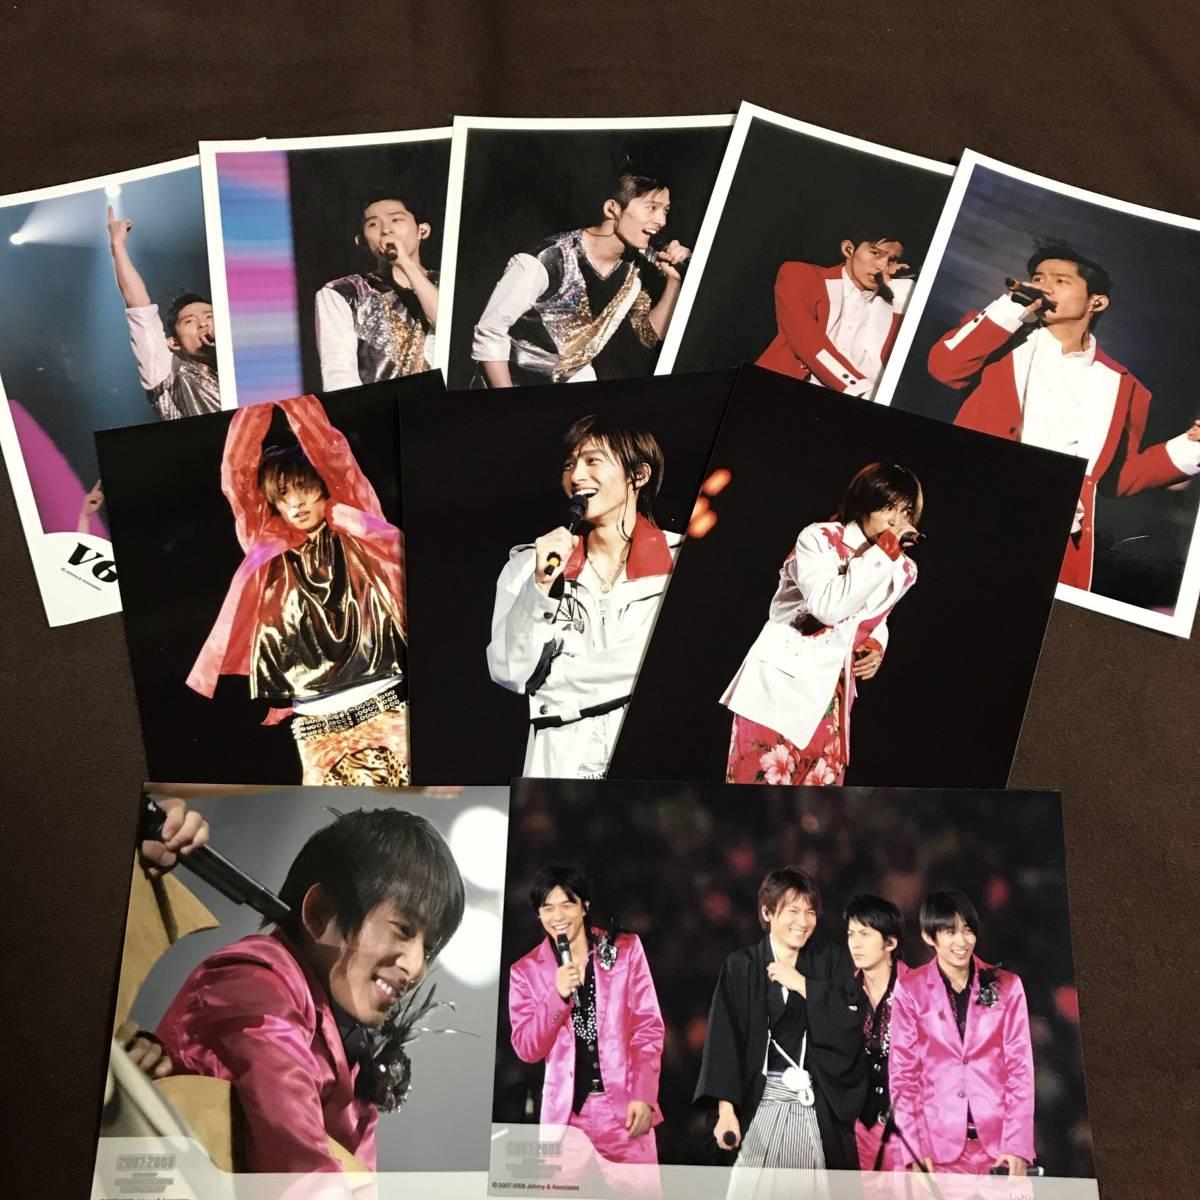 V6 三宅健 公式写真 写真 ブロマイド グッズ ③ コンサートグッズの画像